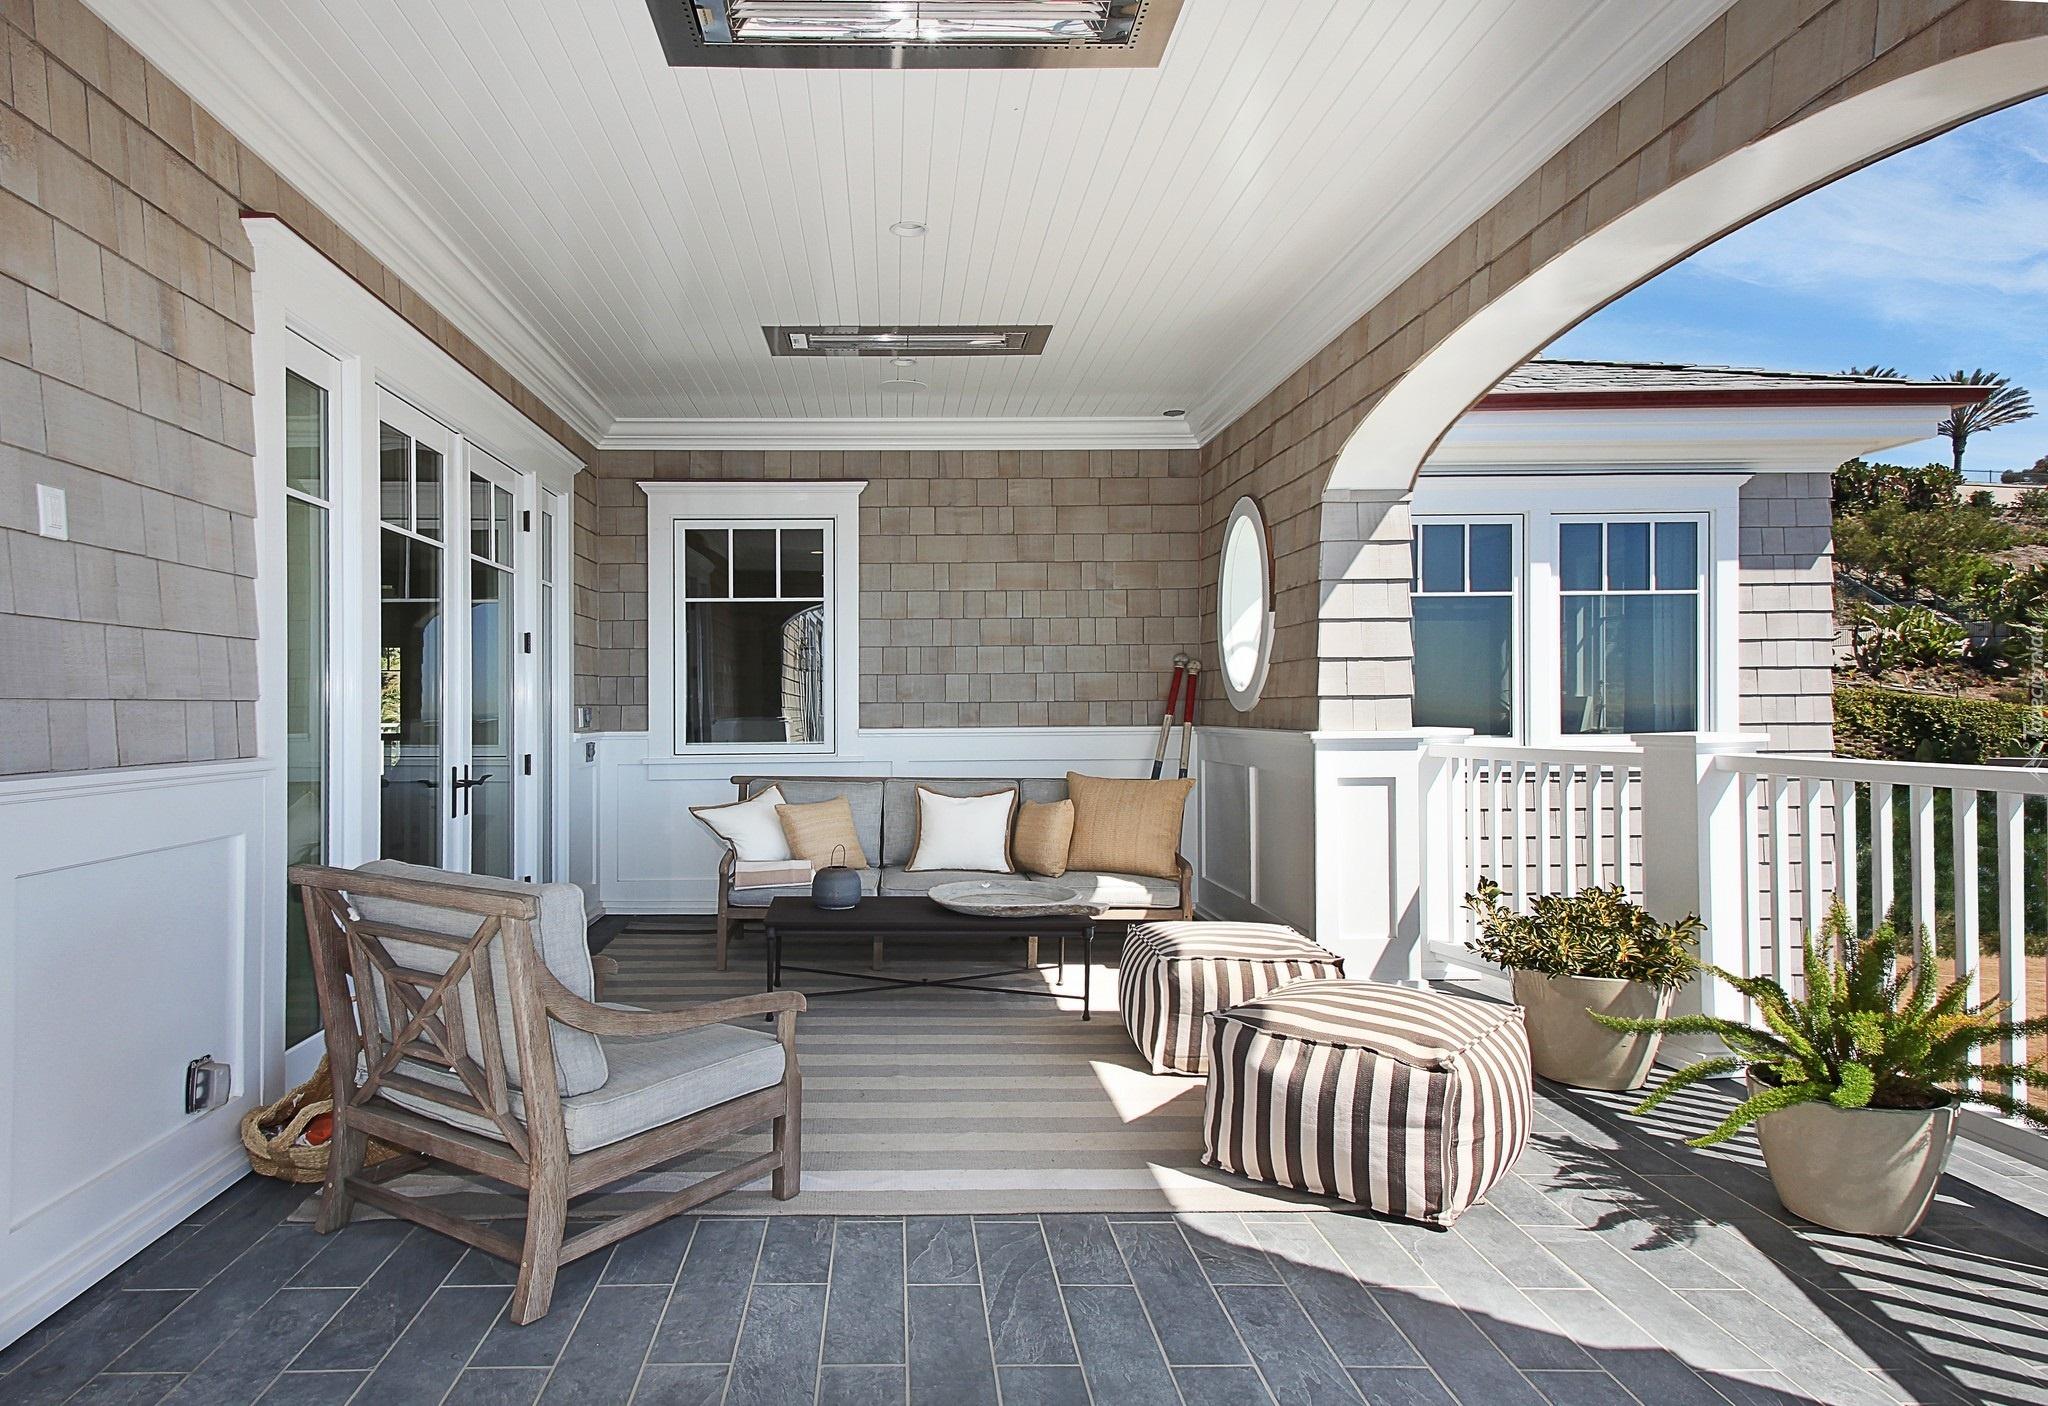 60 inspiring balcony ideas: so are you a fantastic balcony d.